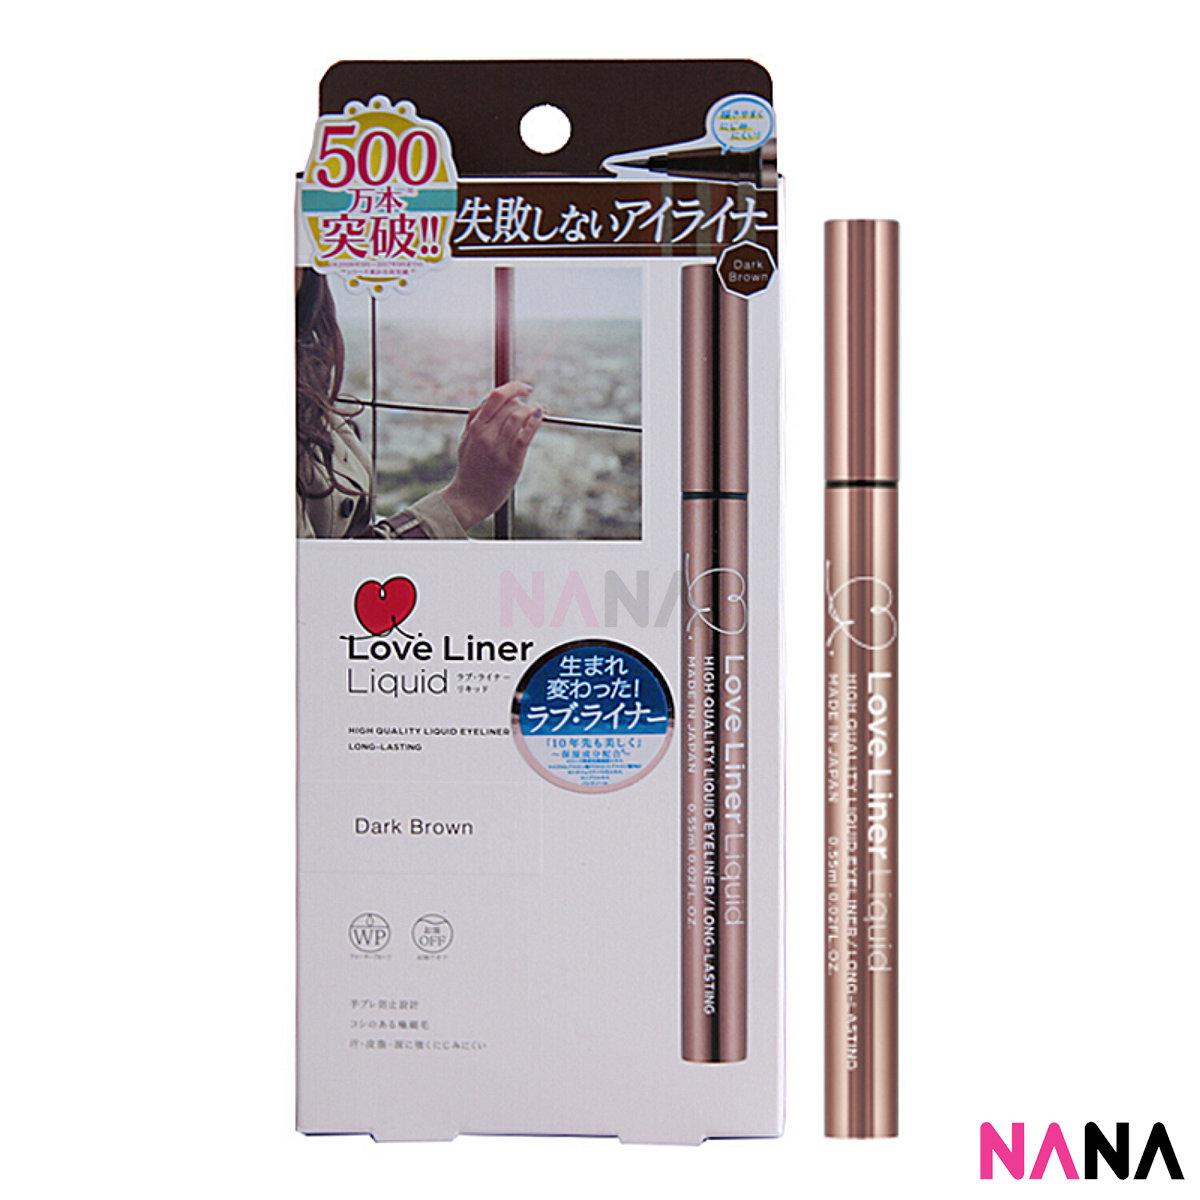 Love Liner 2018 Liquid Eyeliner 0.55ml - Dark Brow